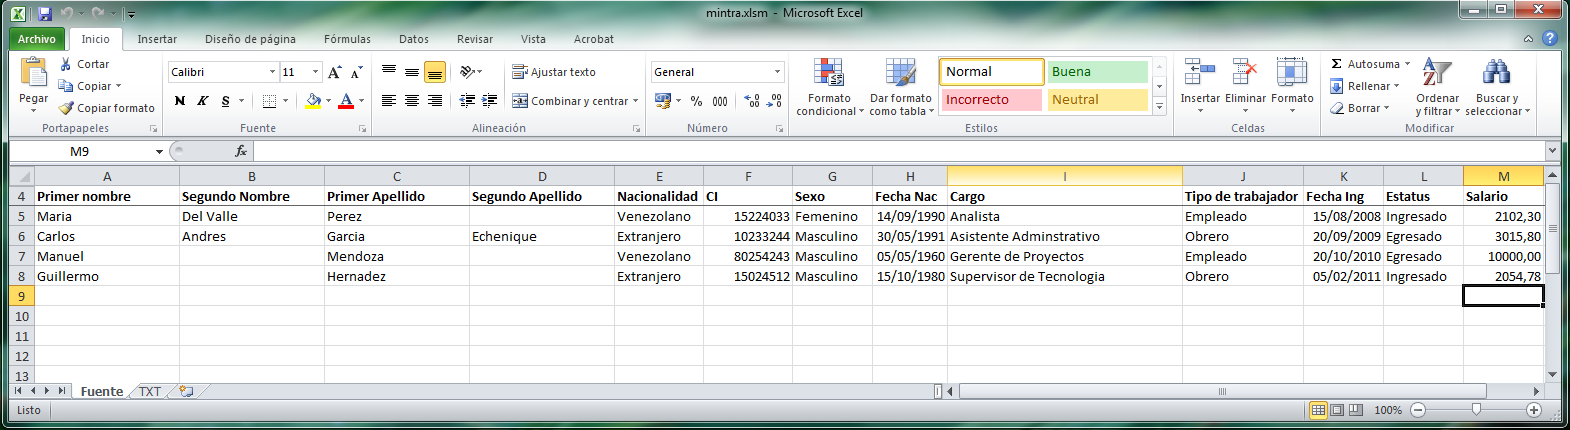 Minpptrass hoja de excel para convertir a txt artifex web for Formato nomina excel